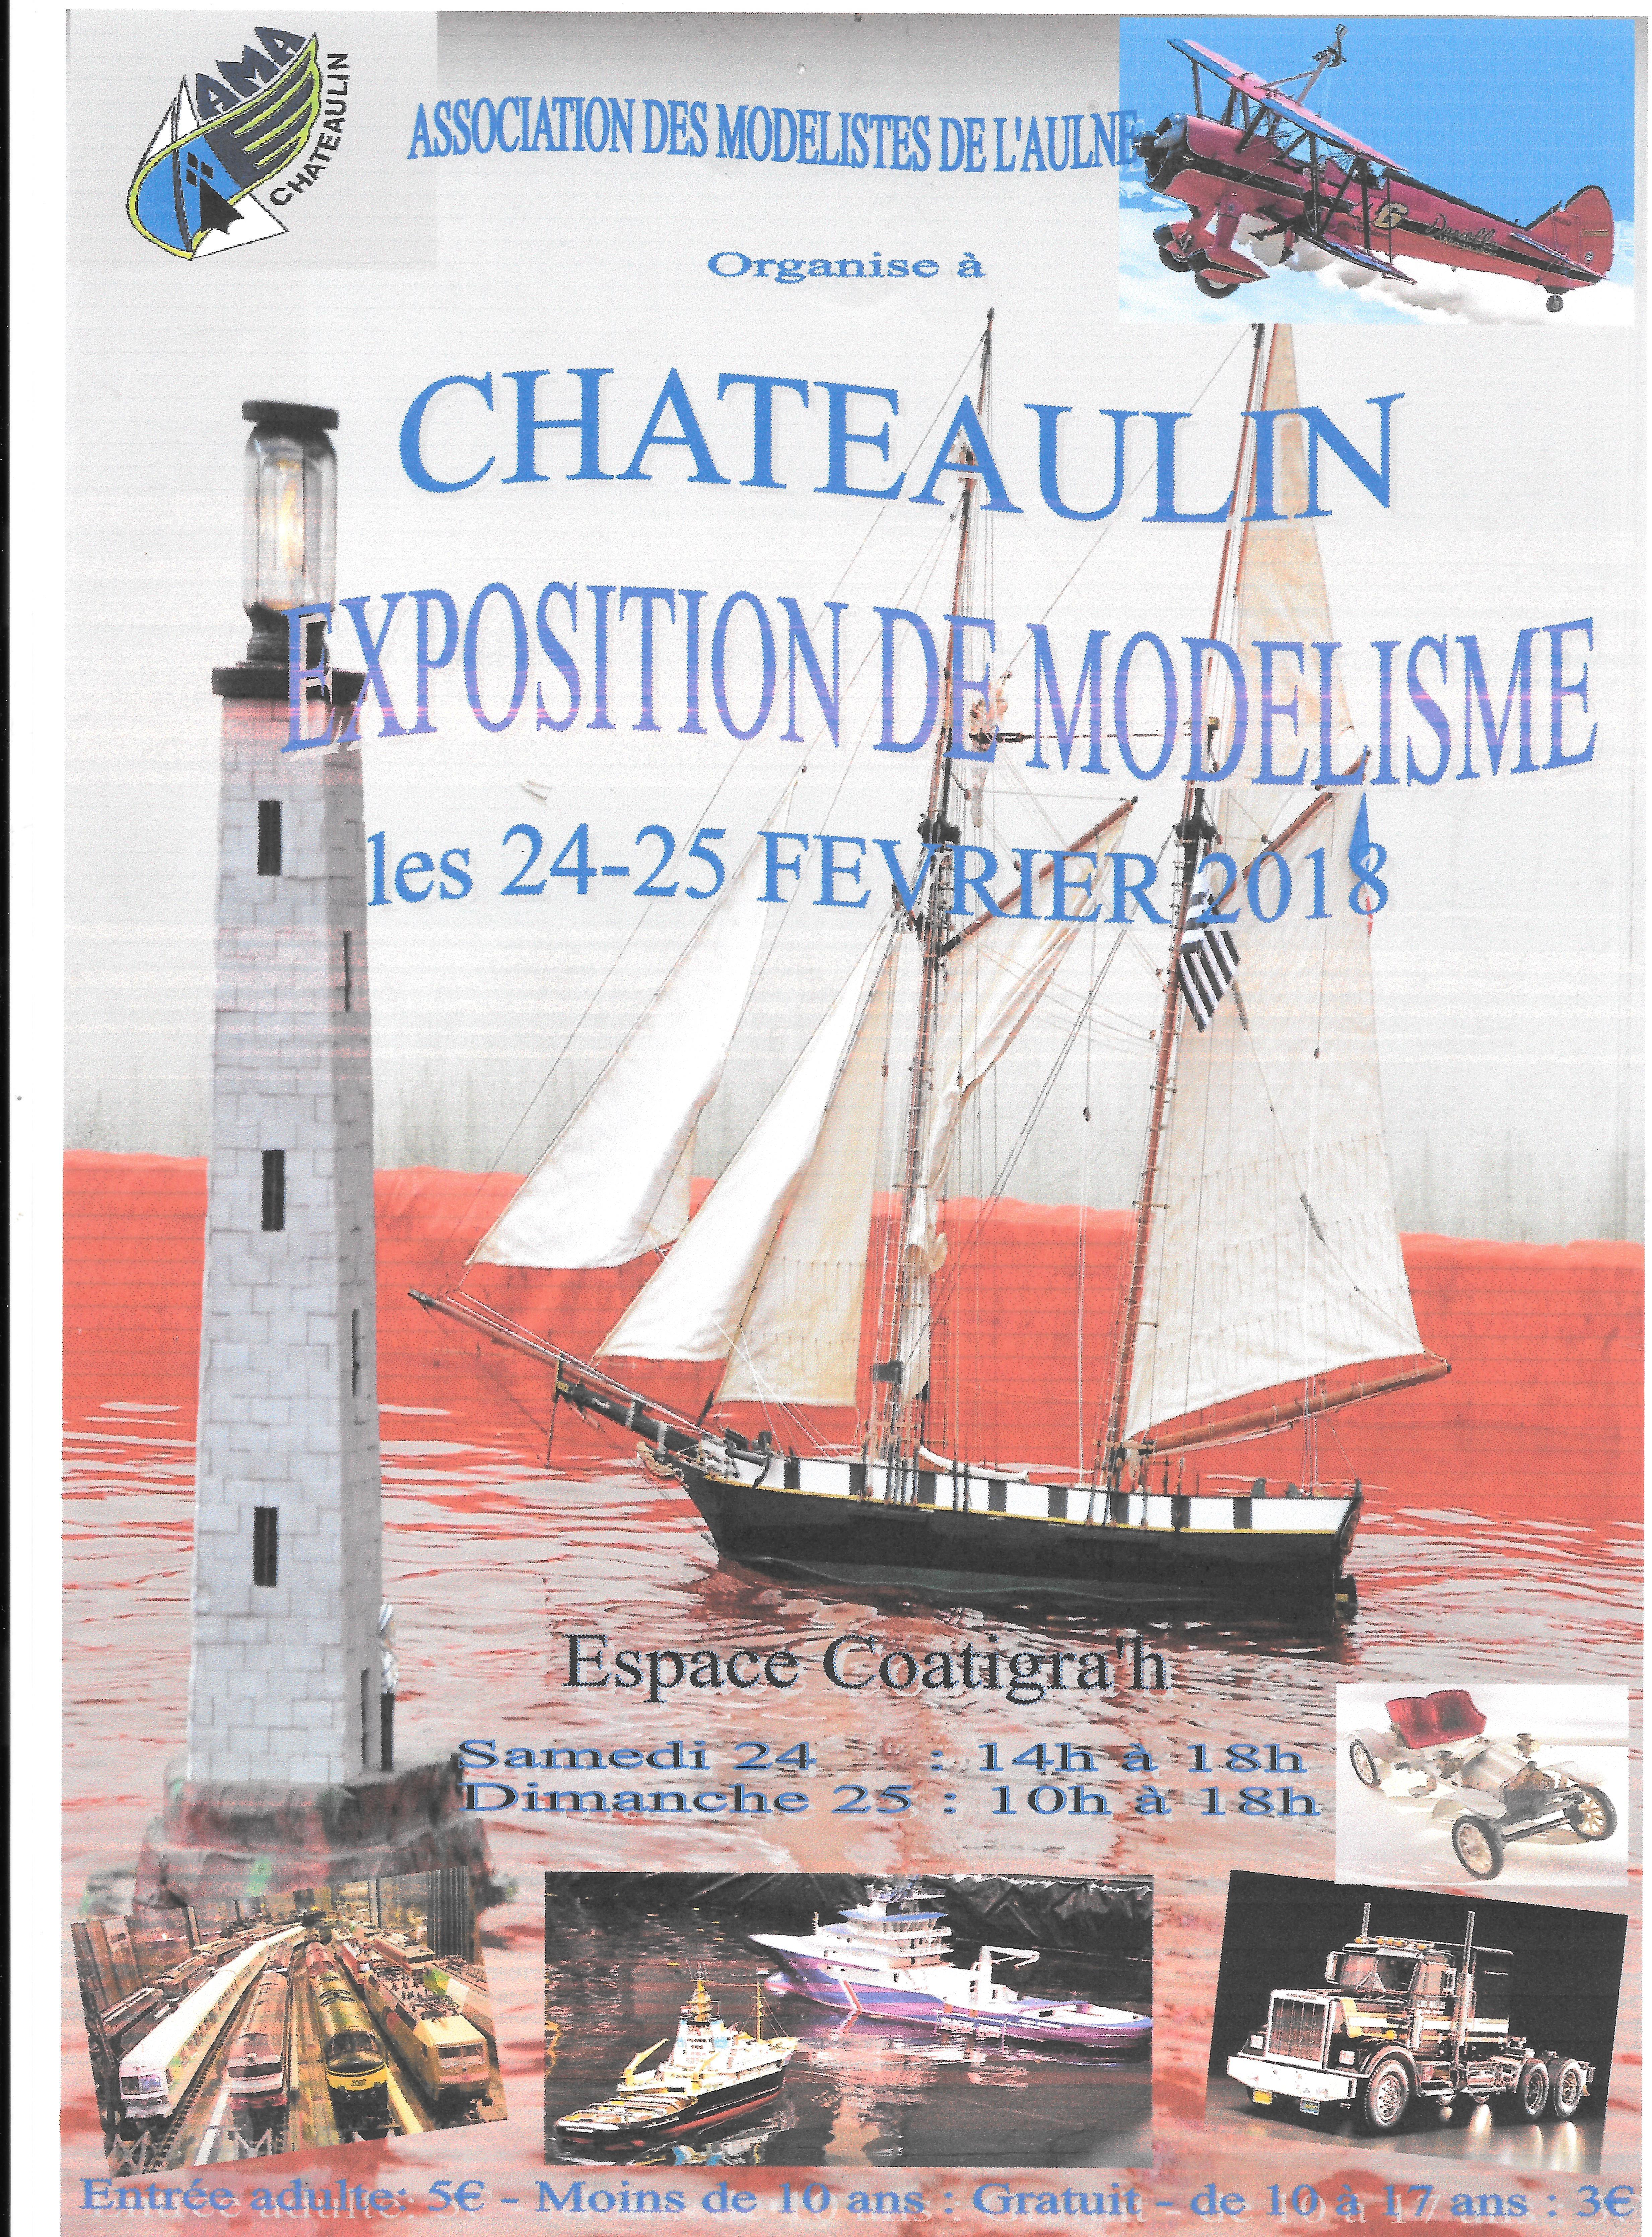 Chateaulin 17121001320170840